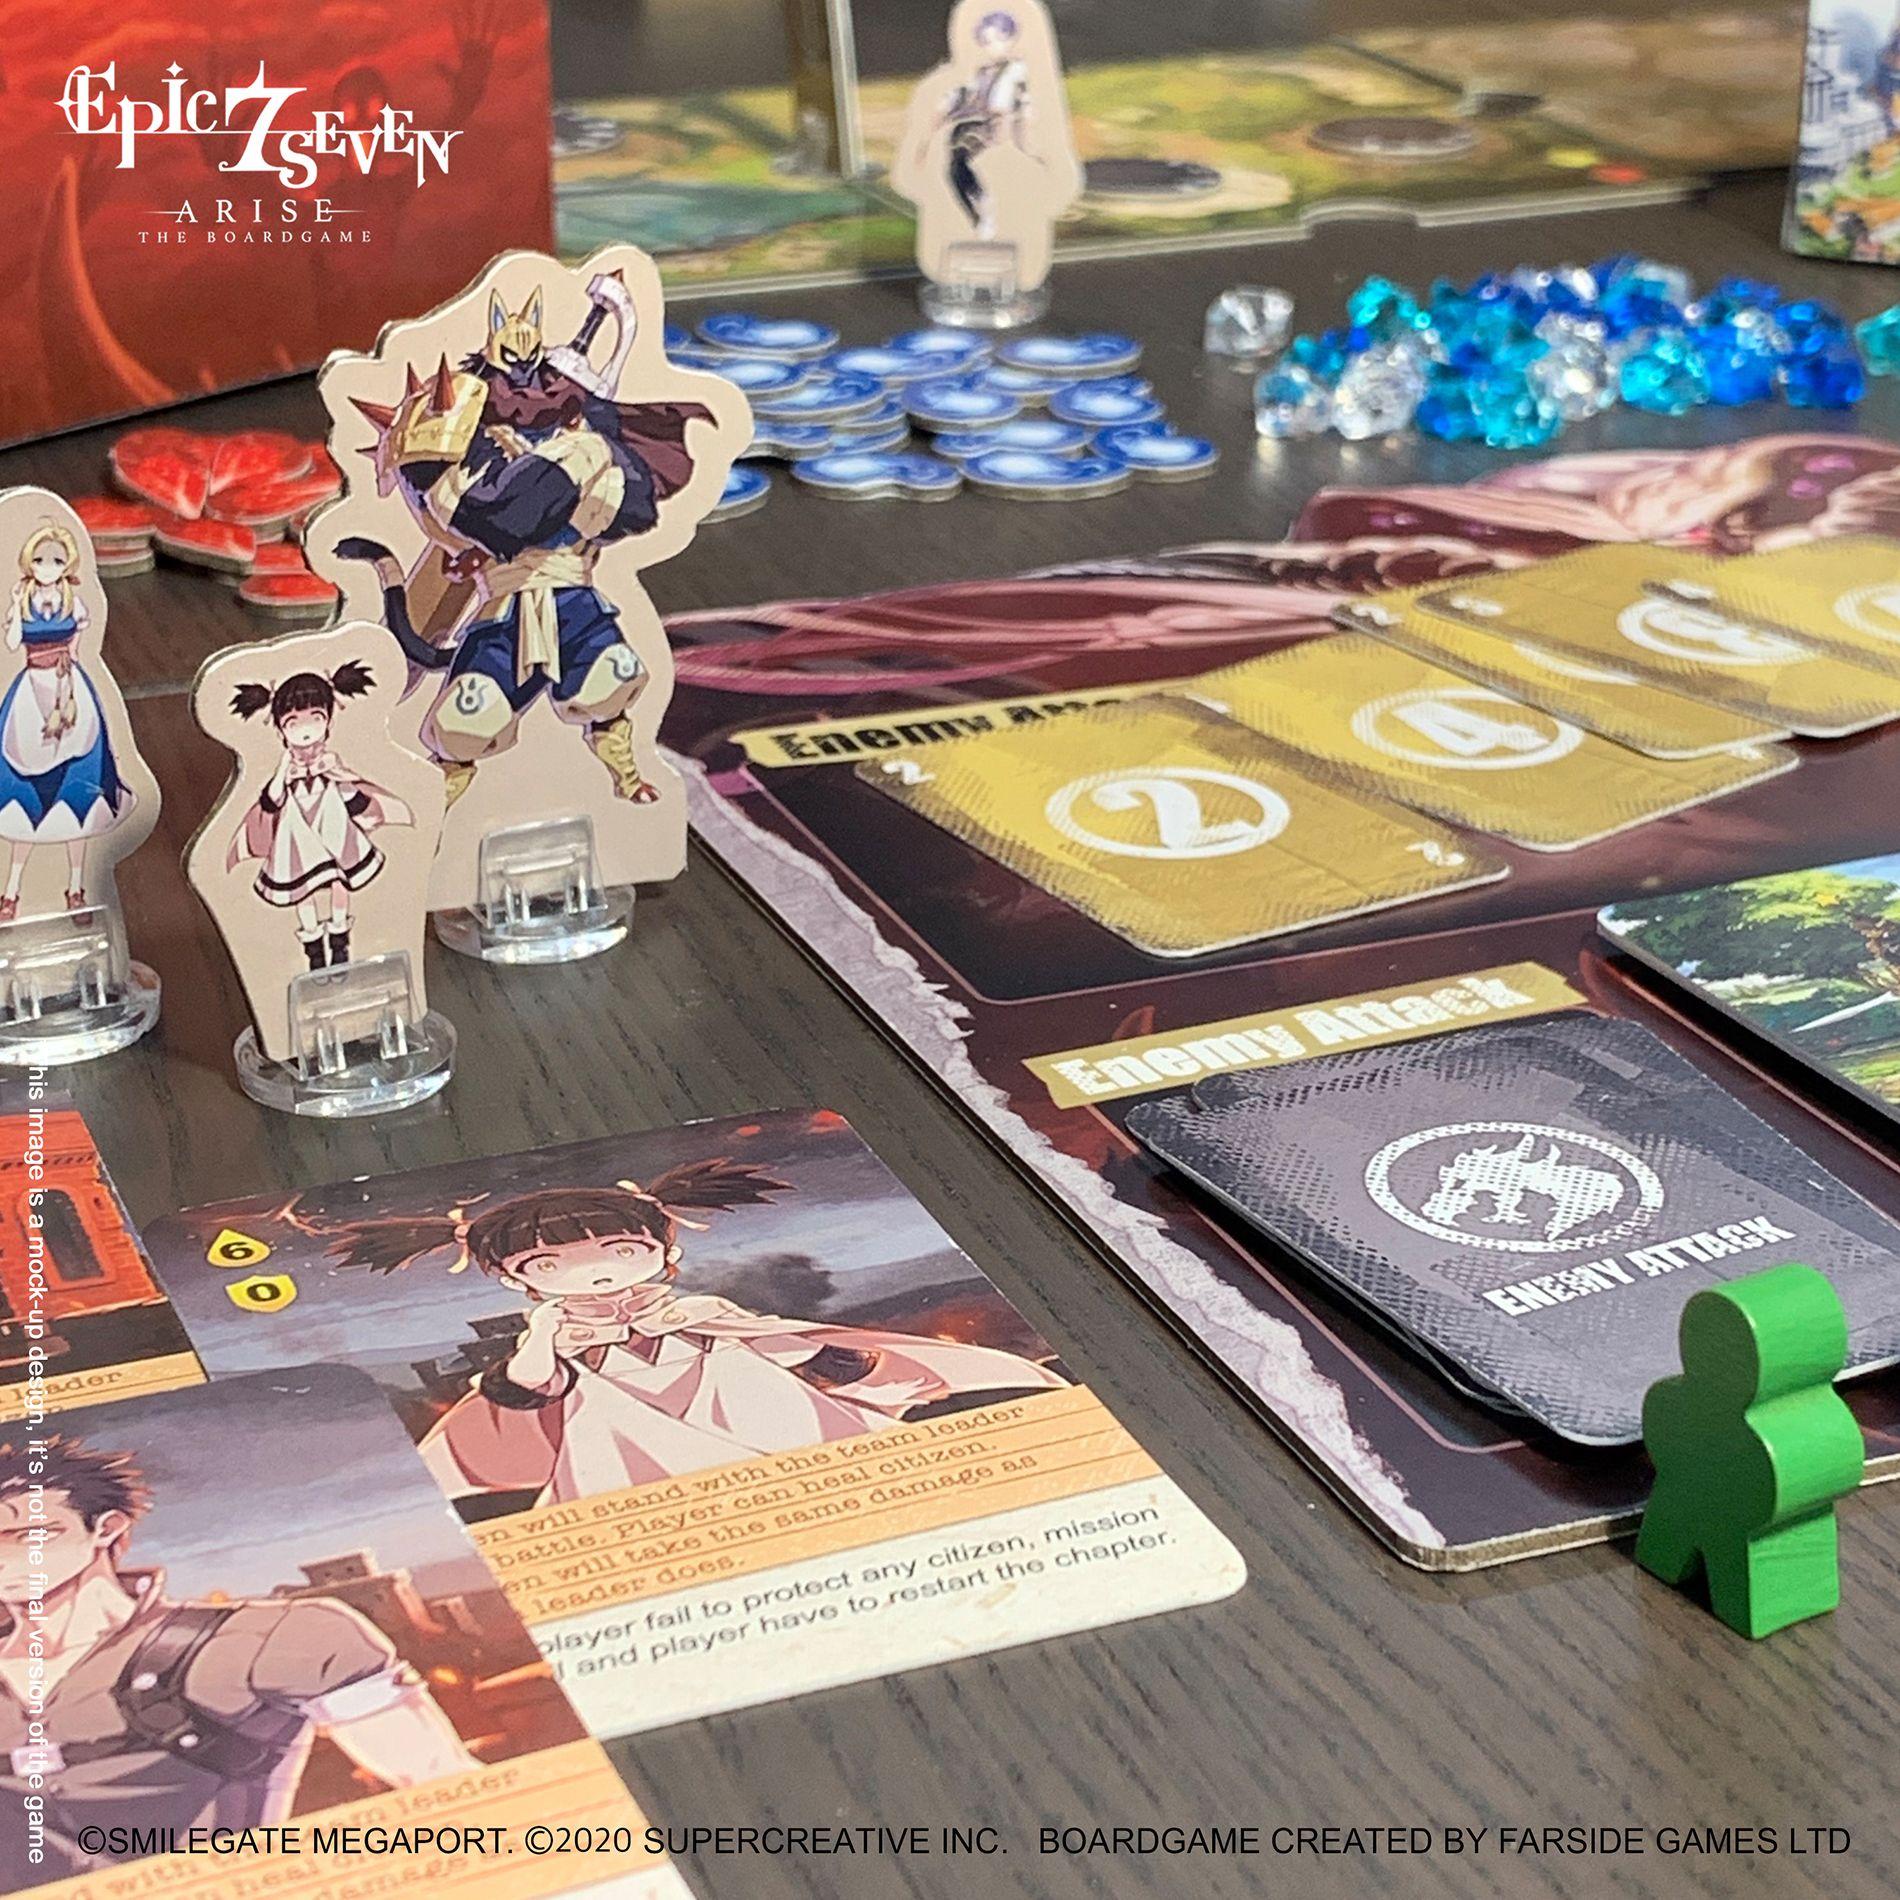 Epic Seven Arise The Boardgame Kickstarter 12 De Enero 2021 17 00 Cet